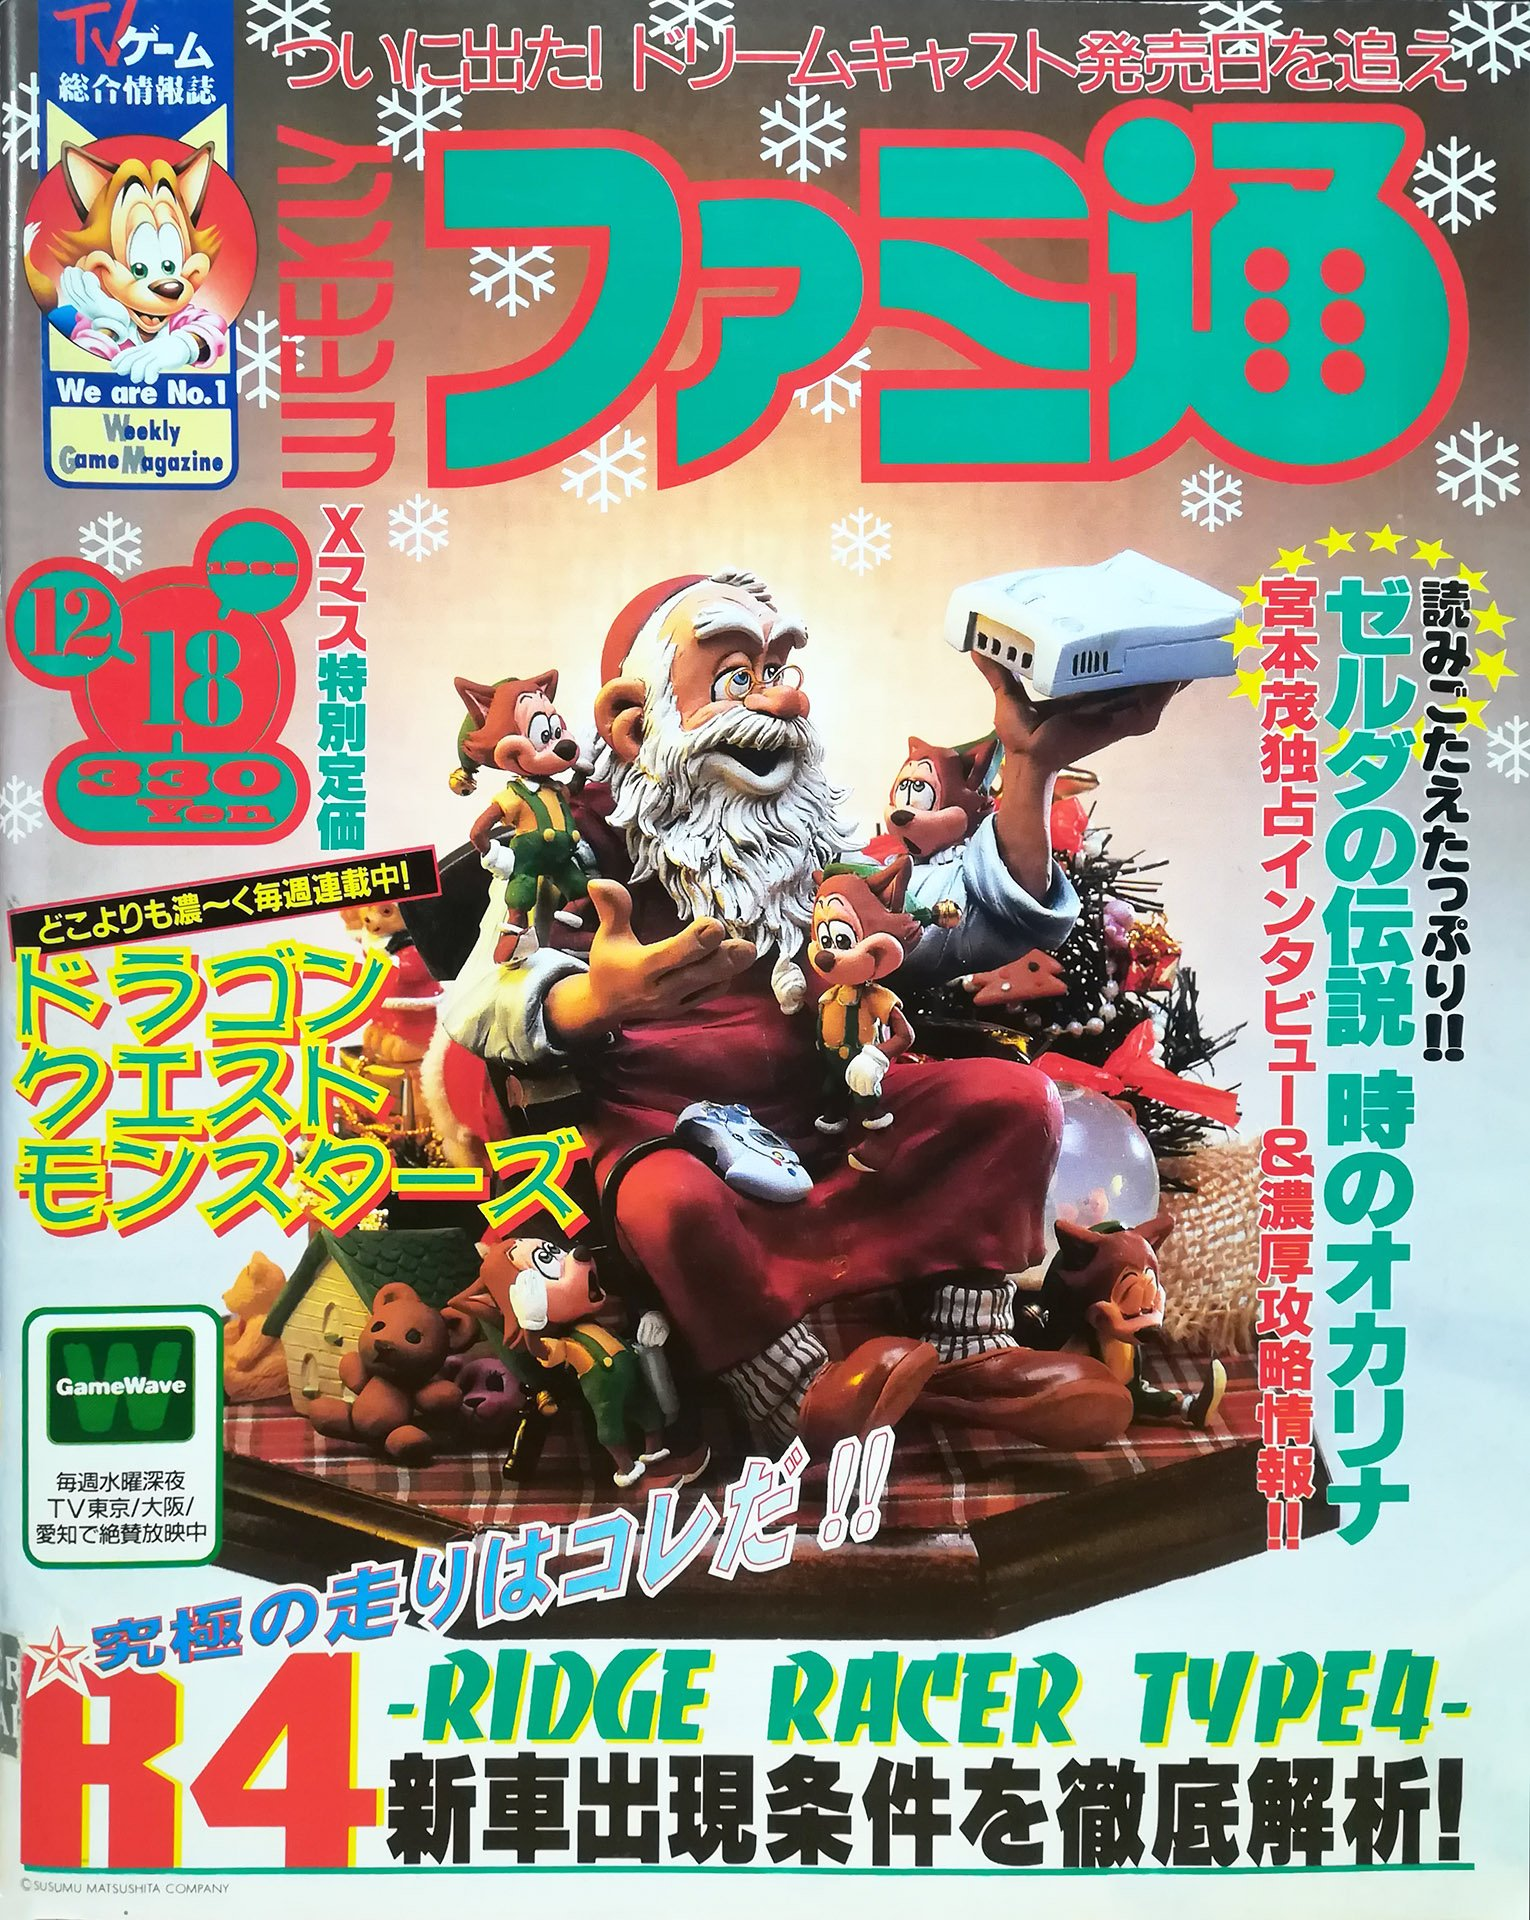 Famitsu 0522 (December 18, 1998)